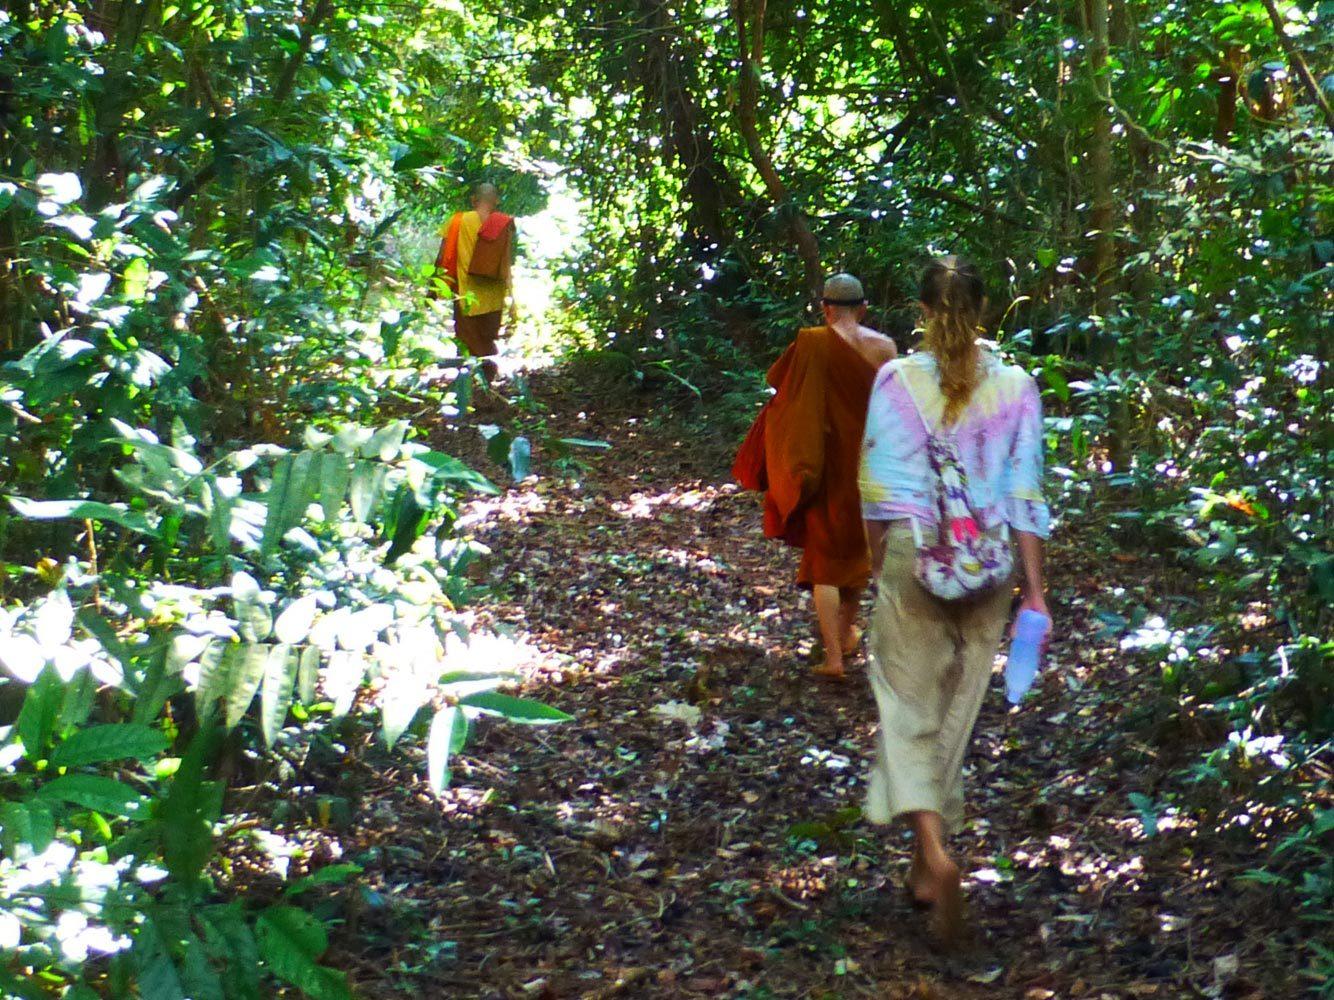 Exploring the jungle - Koh Mak - Thailand 2018